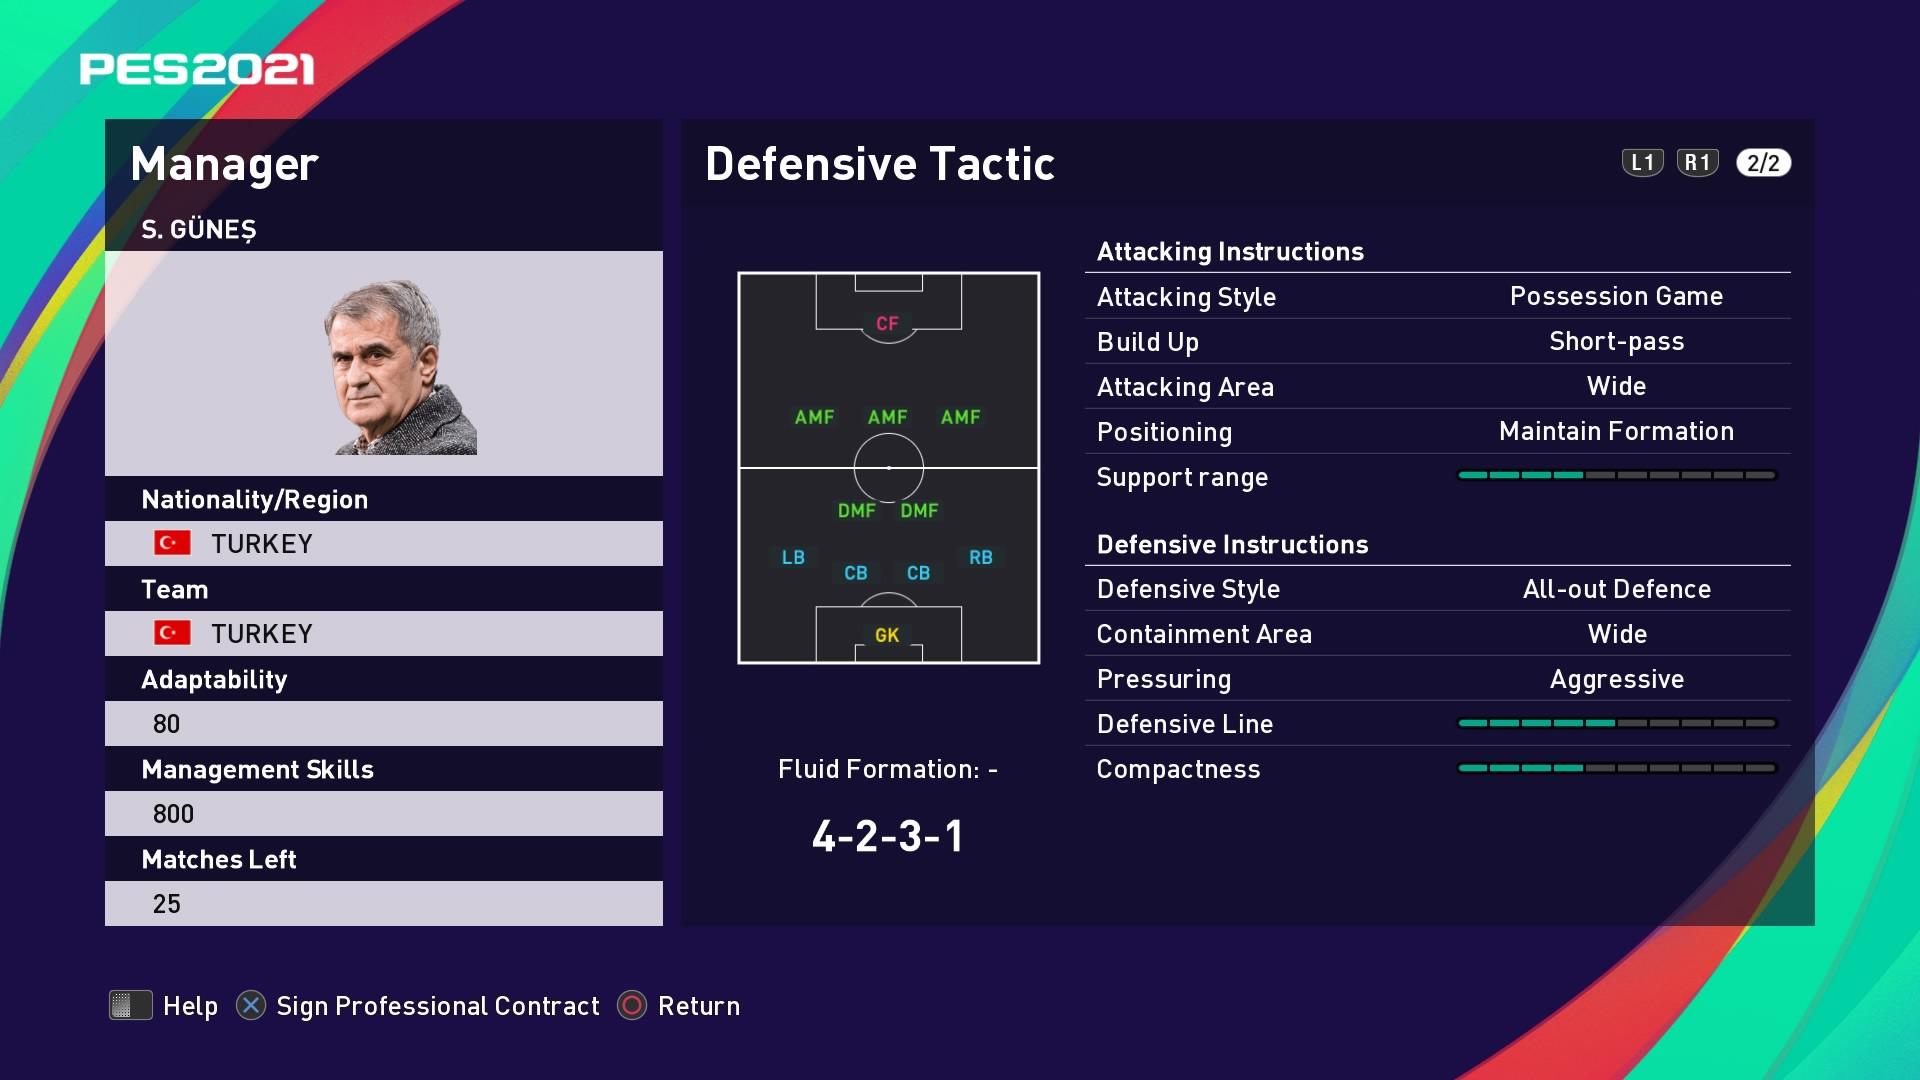 S. Güneş (Şenol Güneş) Defensive Tactic in PES 2021 myClub